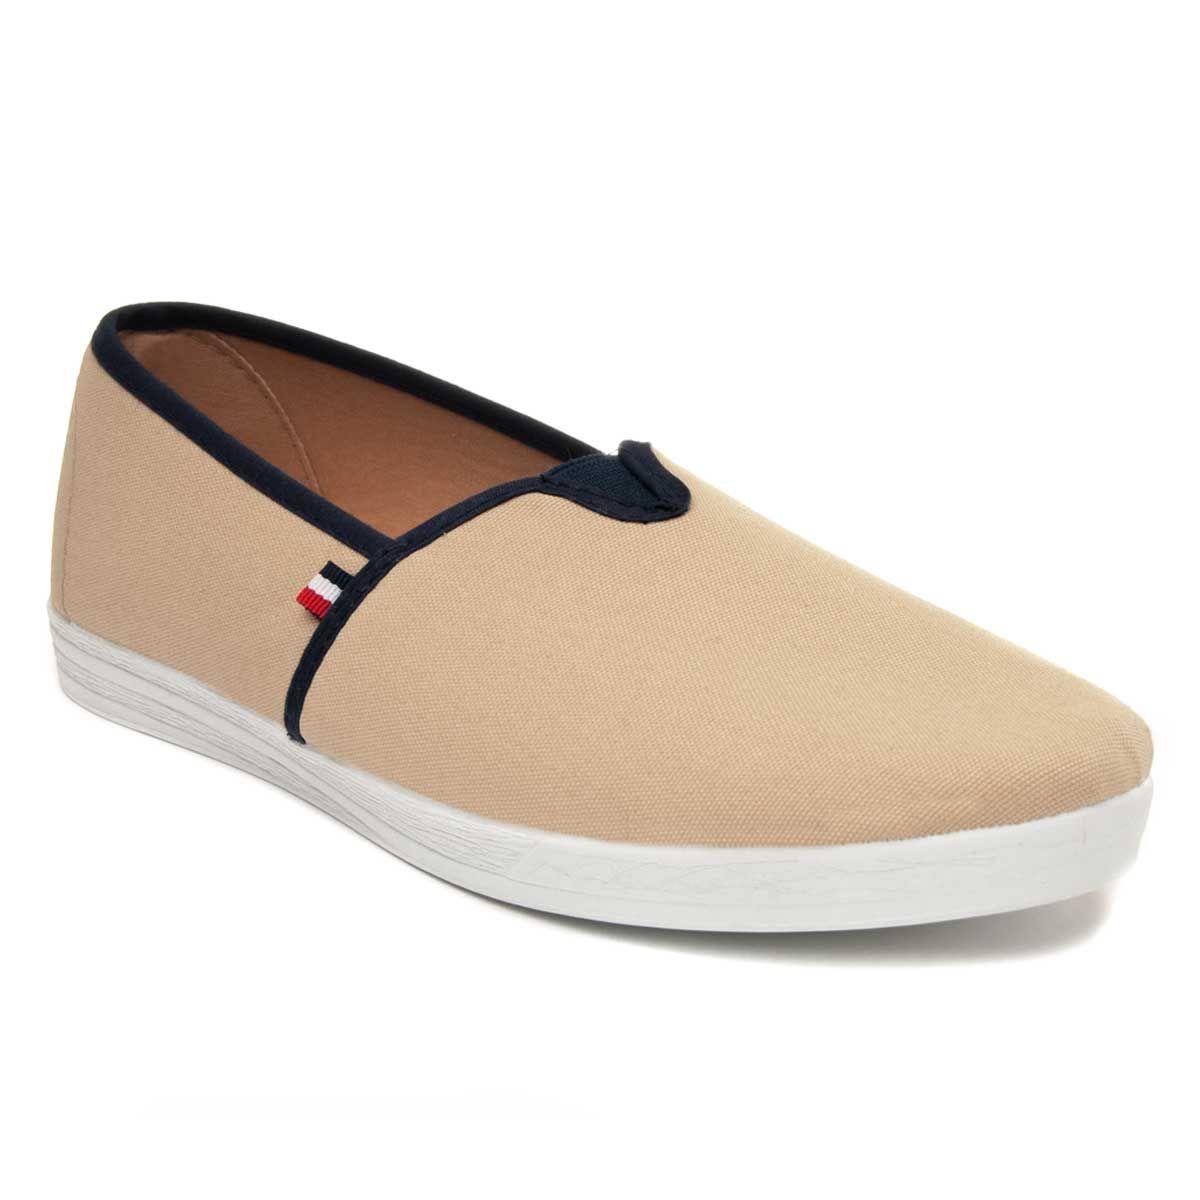 Montevita Comfortable Slipper in Beige